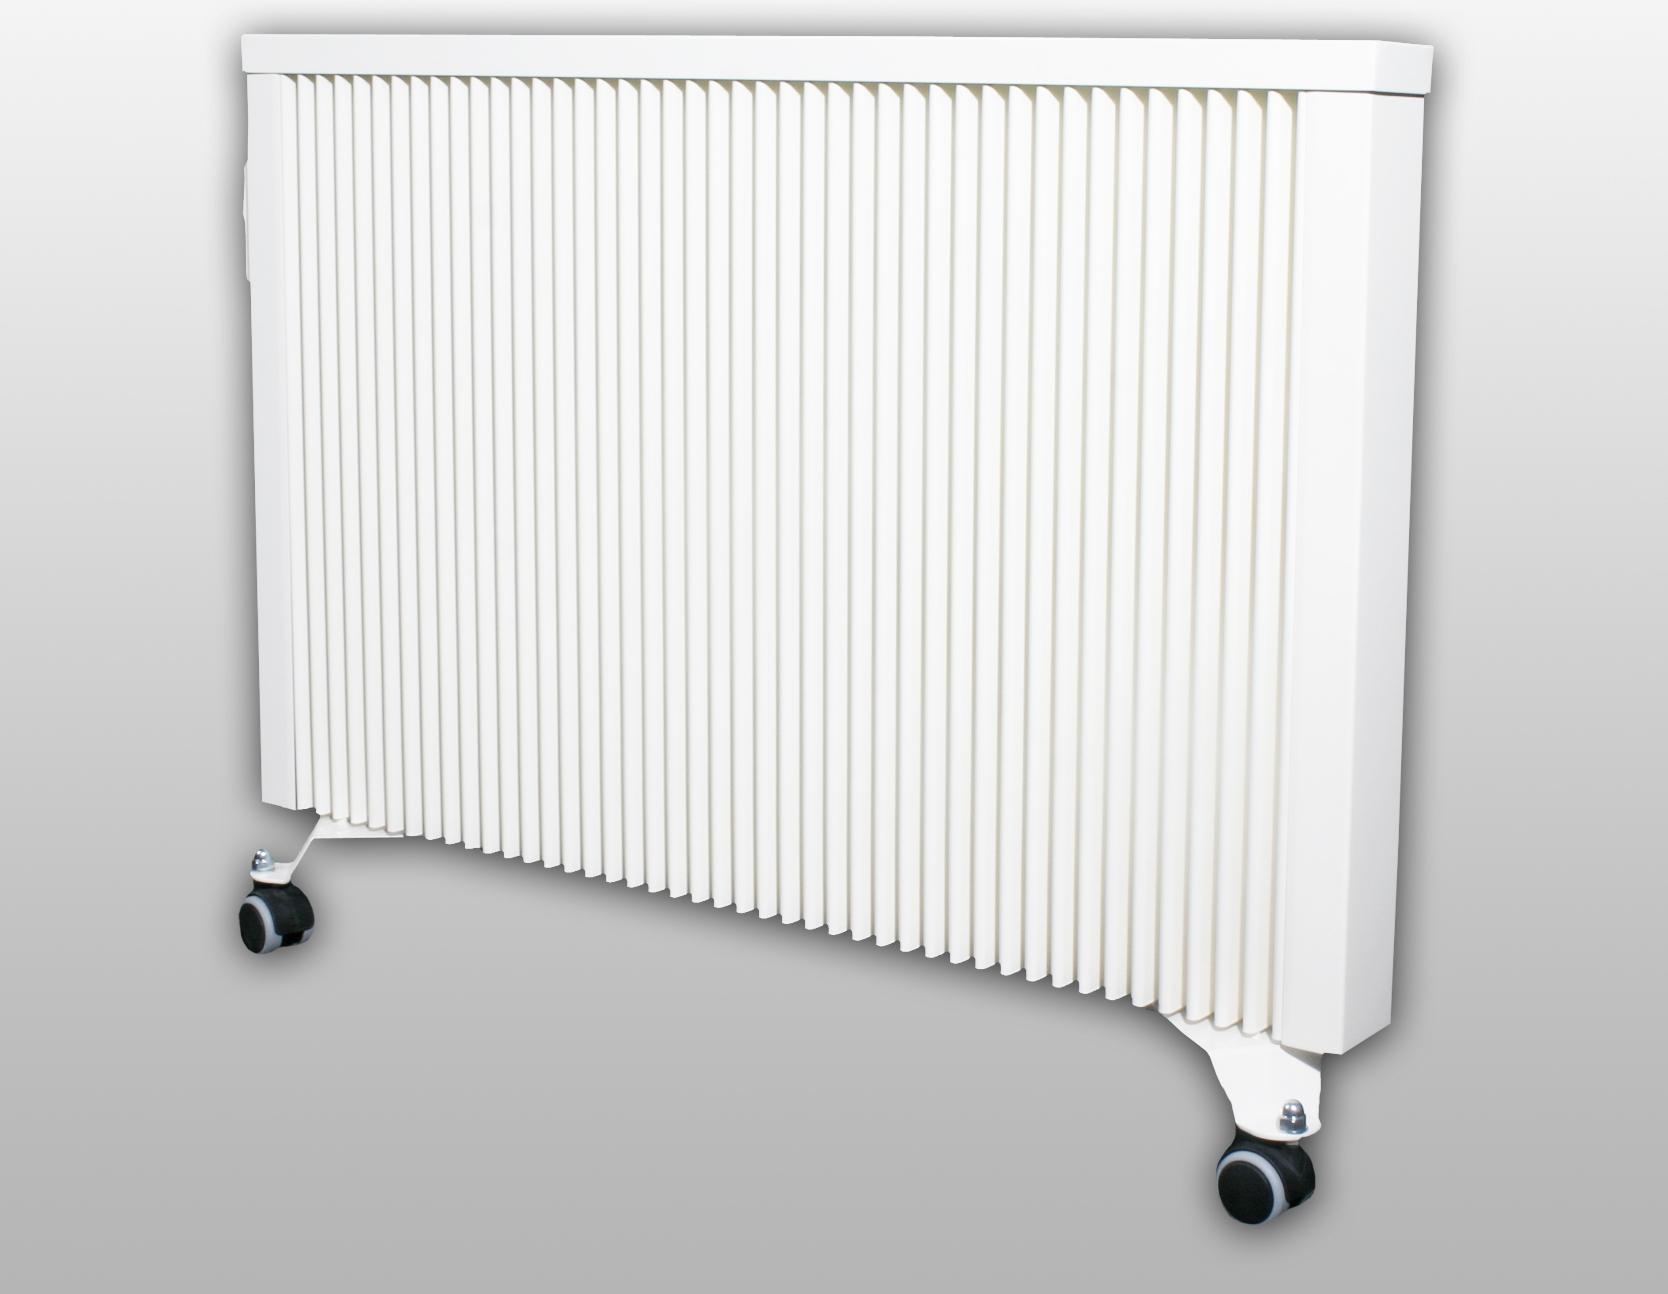 Topný panel série H, TYP H160, 1600 W